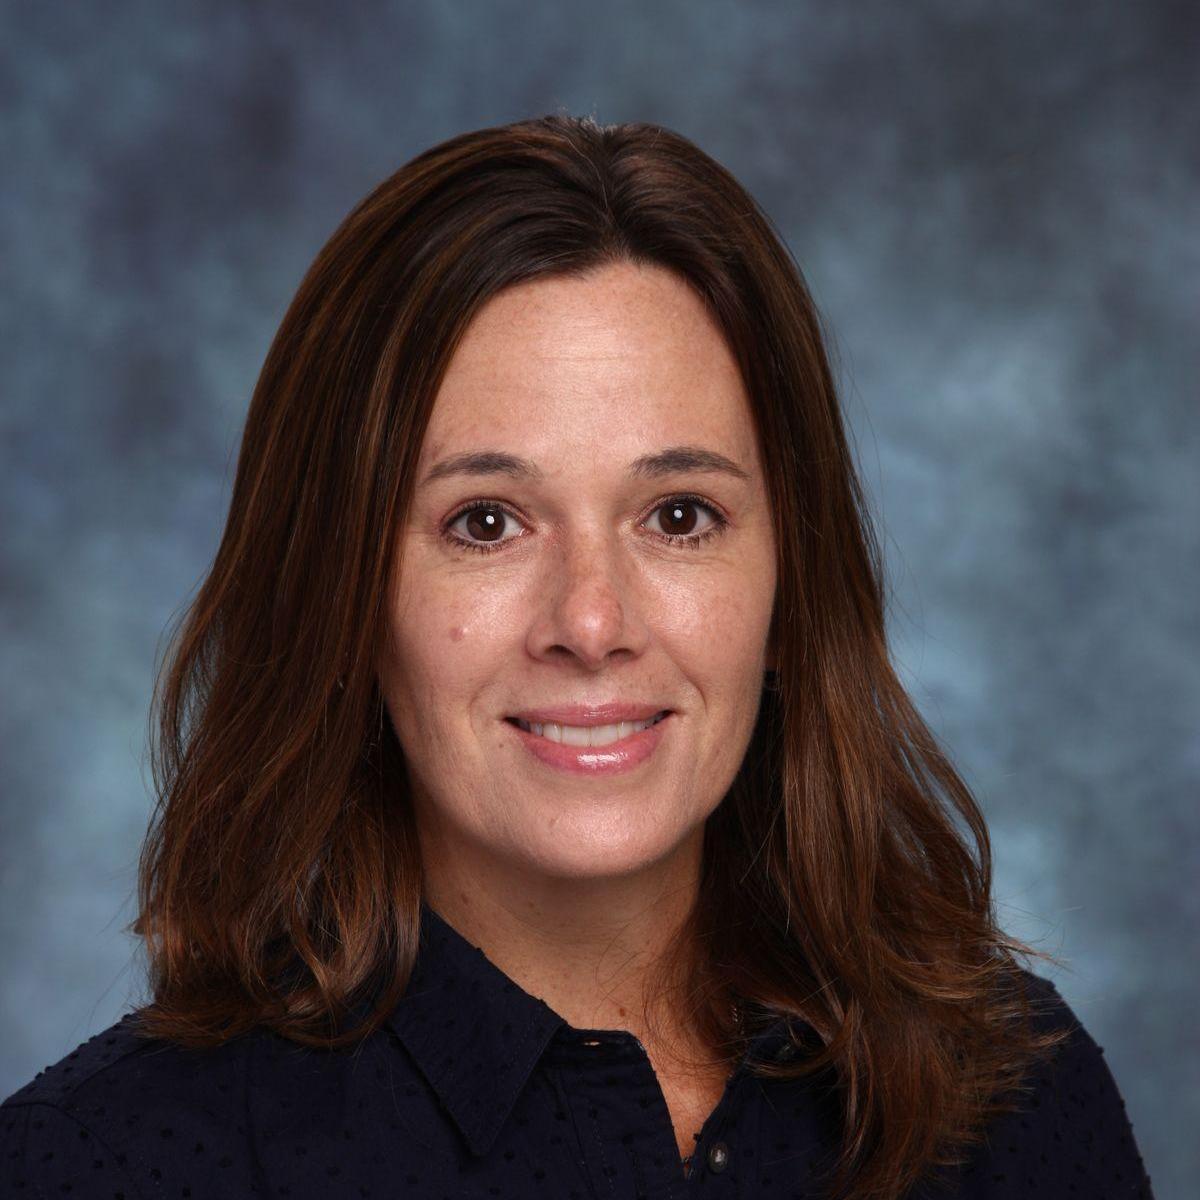 Mrs. Kate Shanley's Profile Photo